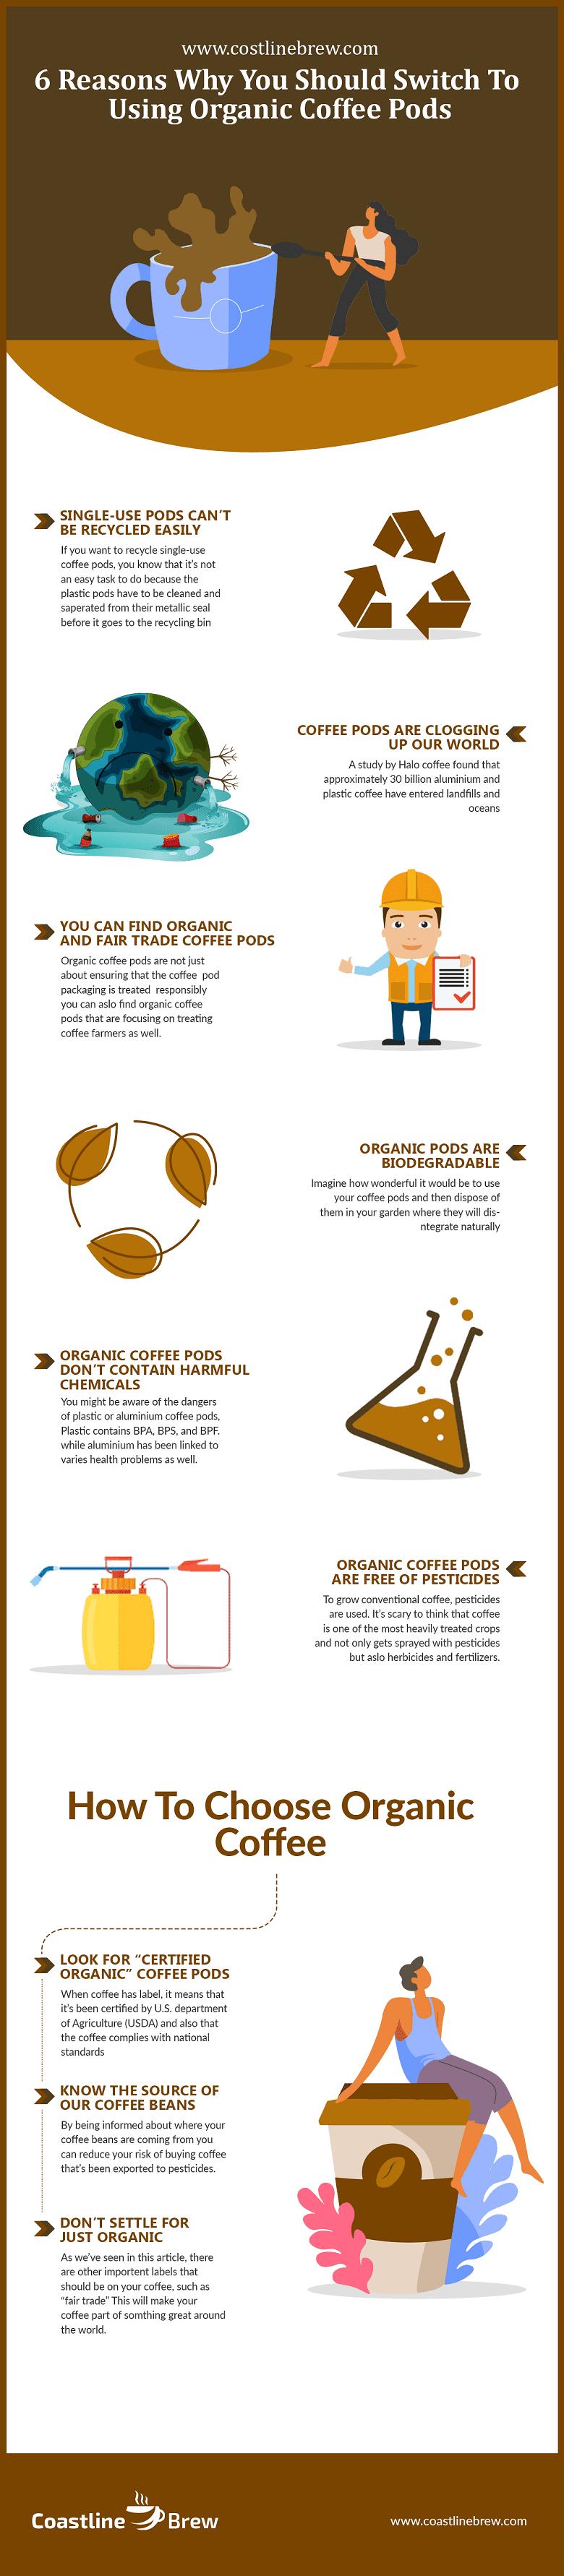 Organic Coffee Pods